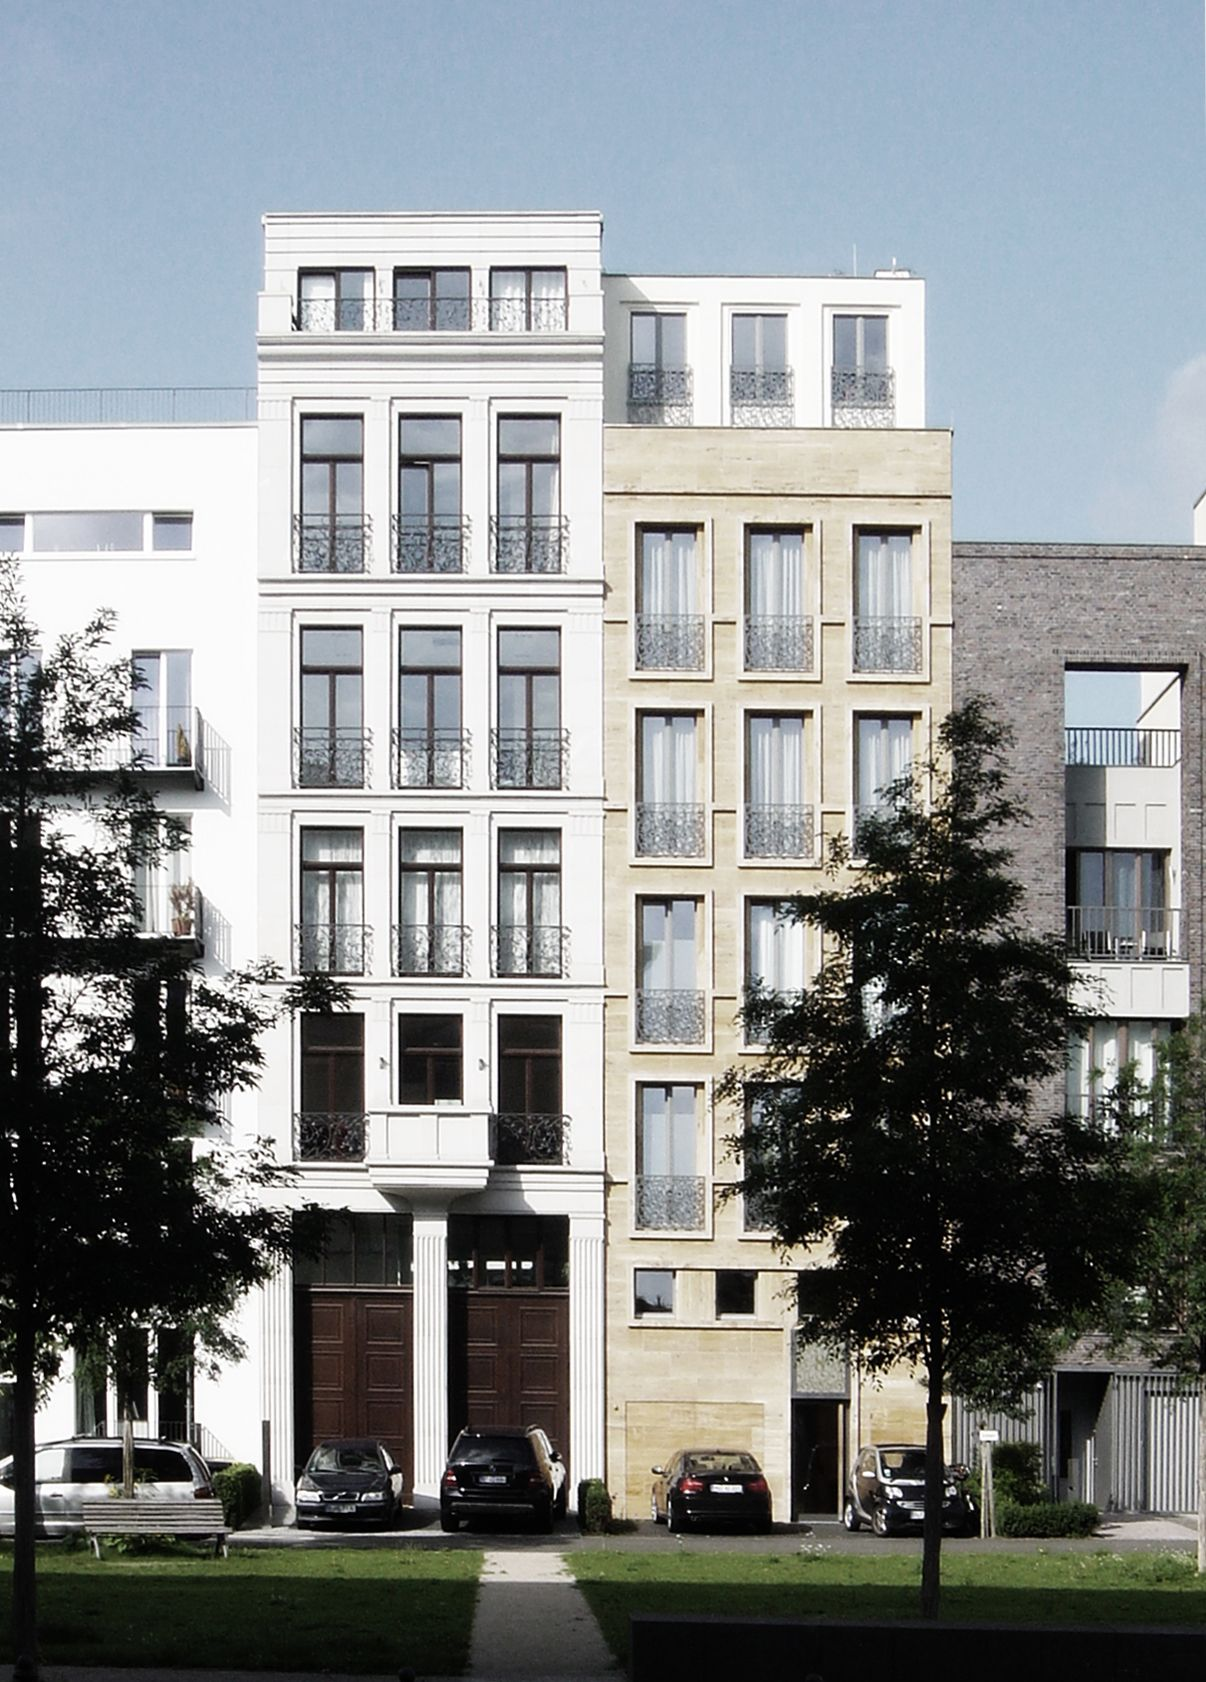 Townhouses on the Caroline von Humboldt weg in Berlin